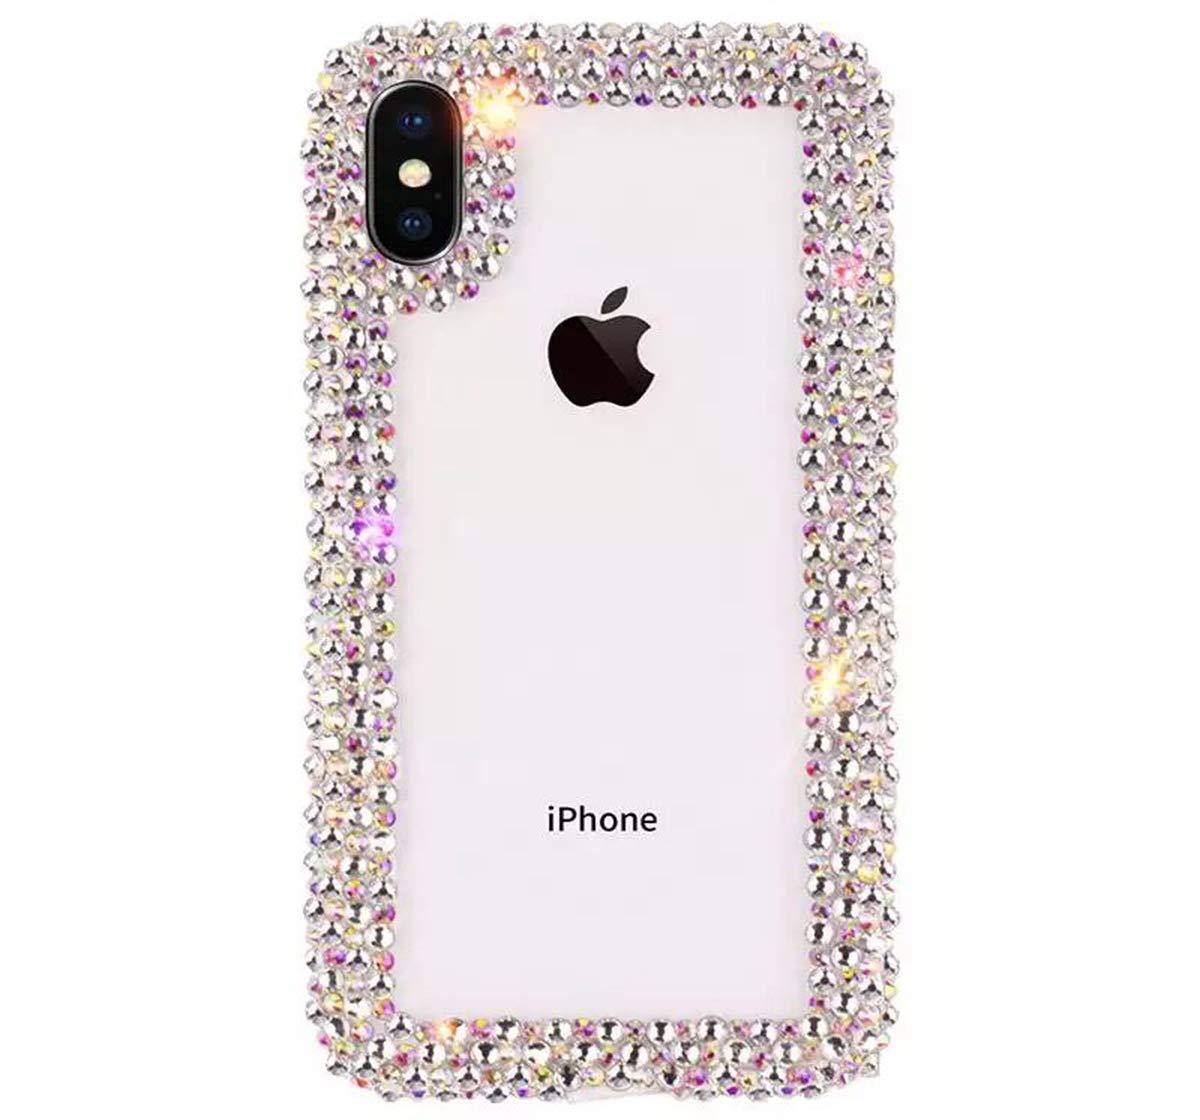 Funda Iphone 11 Pro Max Glitter GENERIC [7XCP67VM]